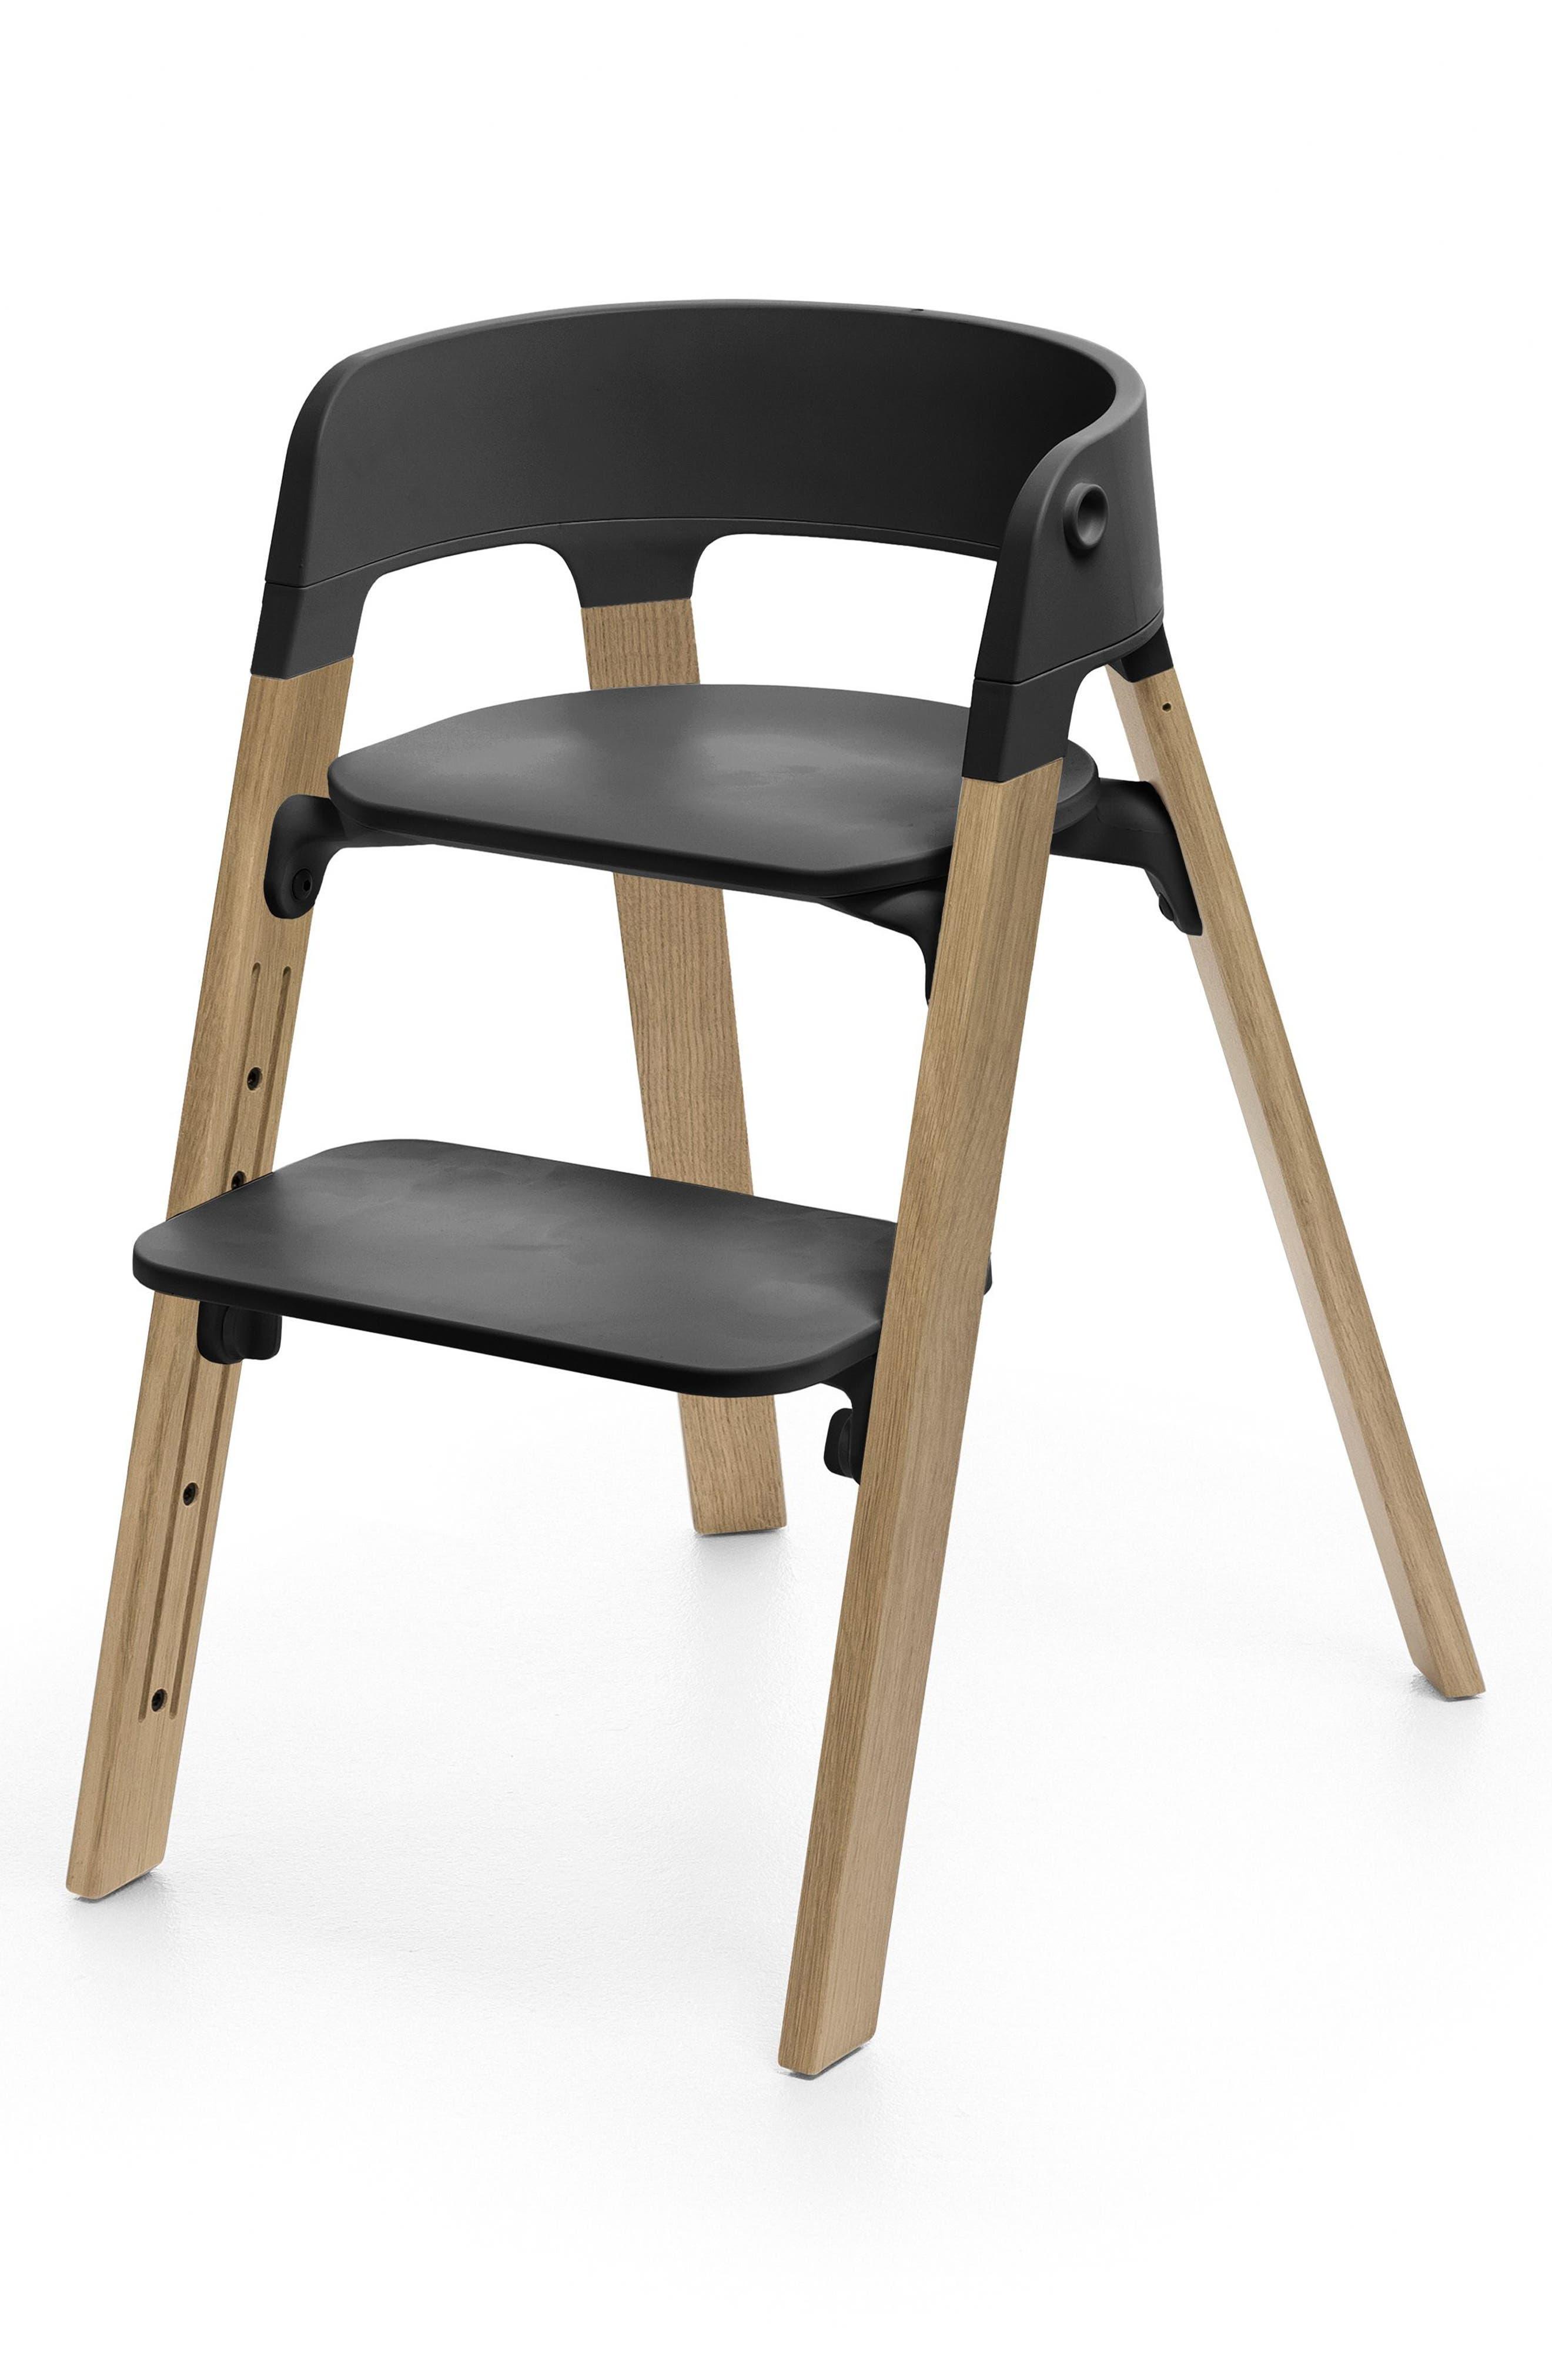 Alternate Image 1 Selected - Stokke Steps™ Chair